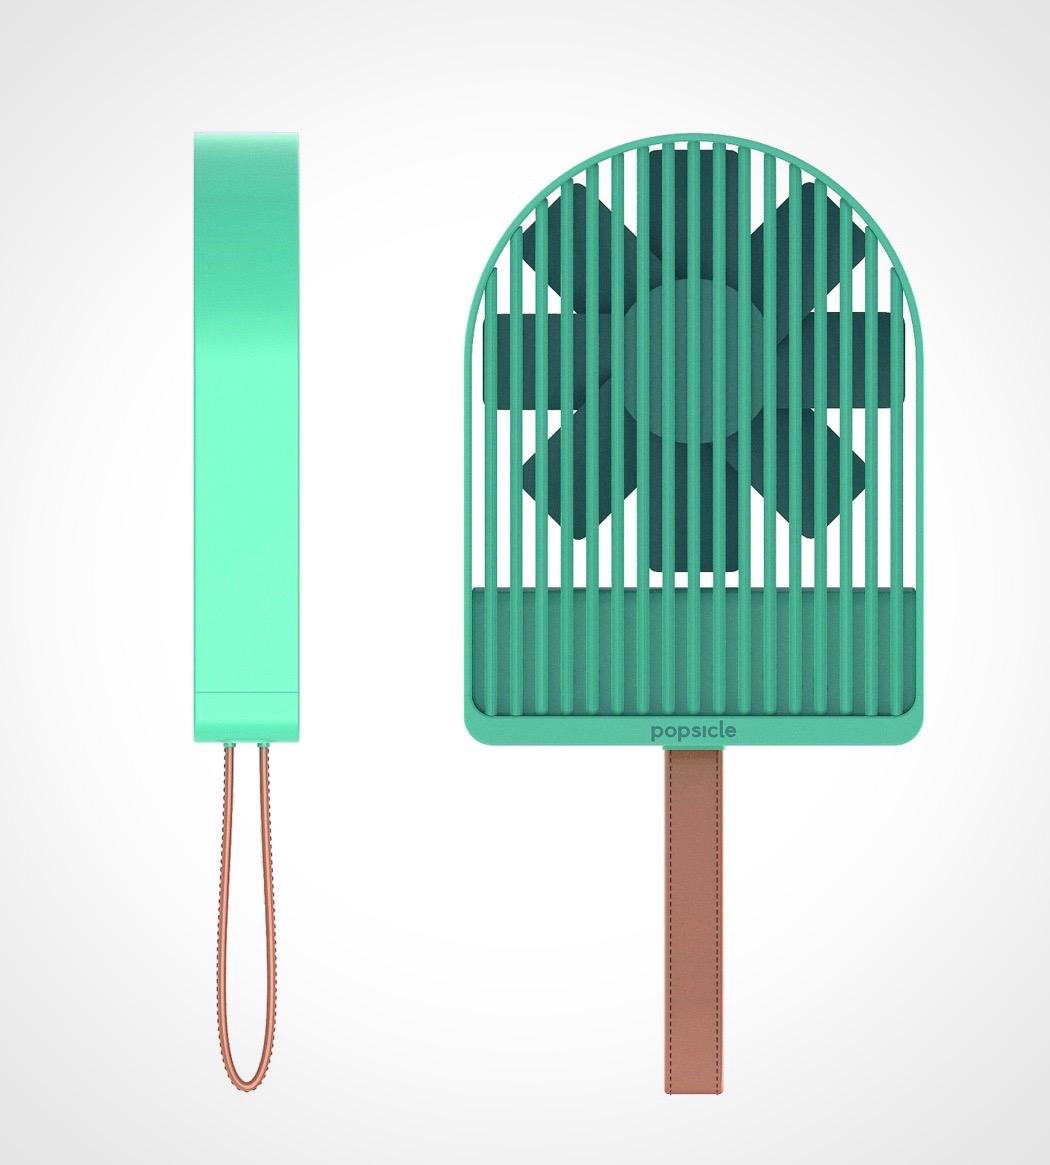 popsicle_04